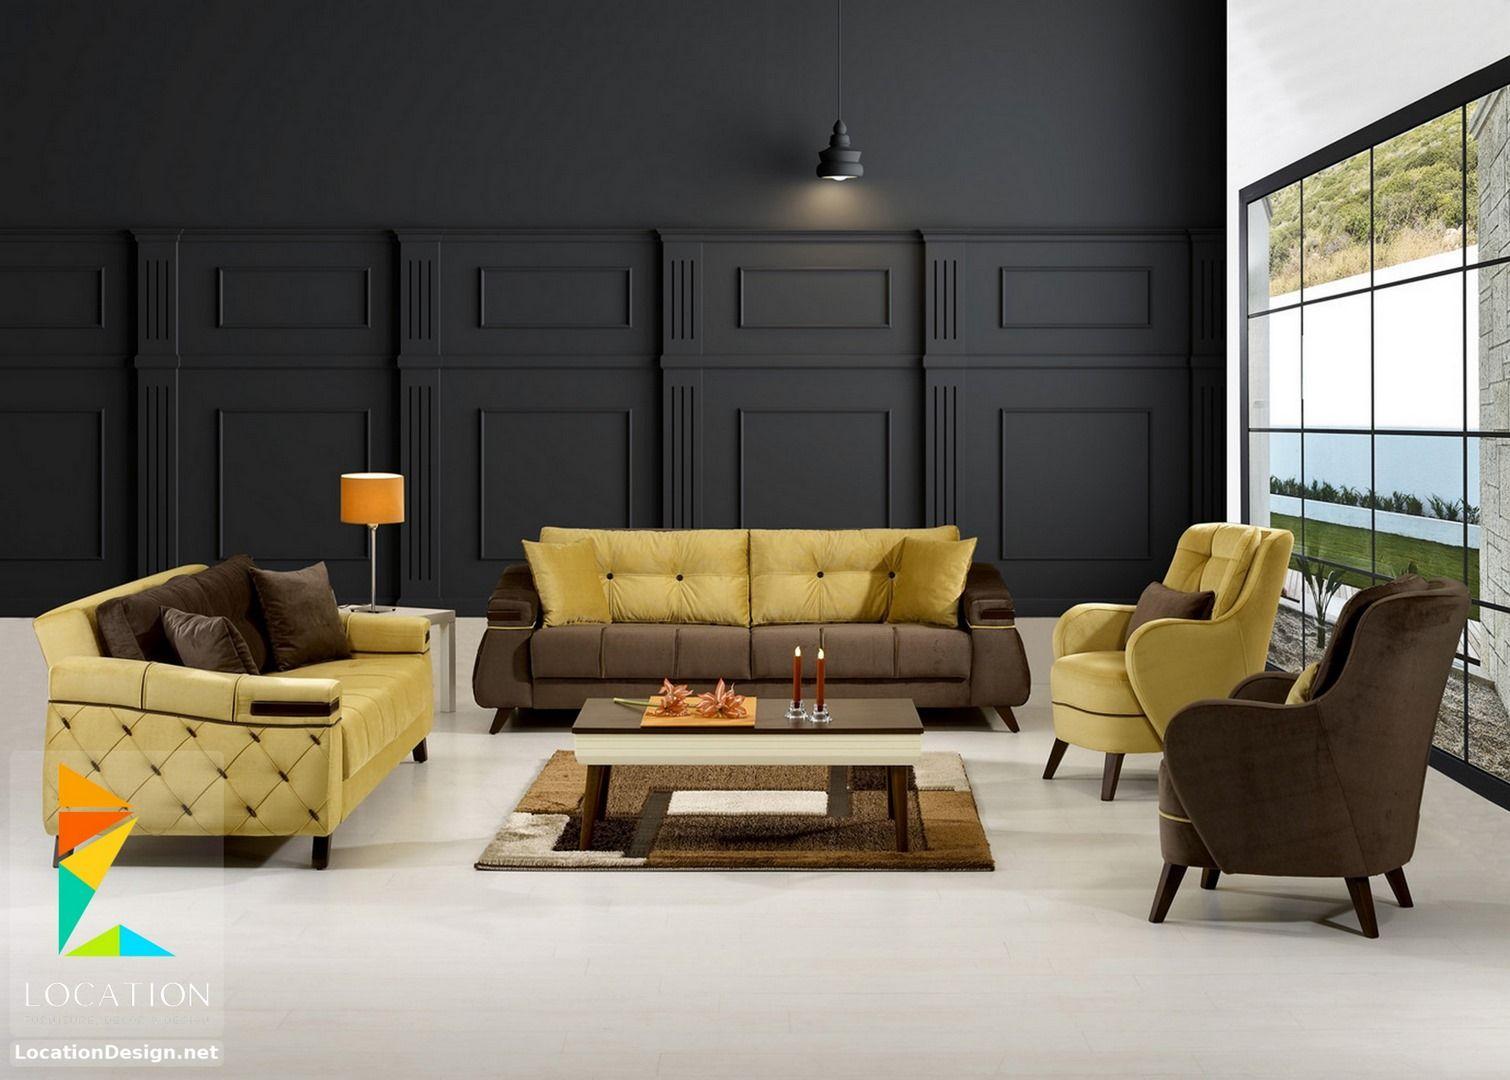 كتالوج صور انتريهات إيكيا Ikea الجديد 2019 | Sofa Design ... tout Salons De Jardin Ikea